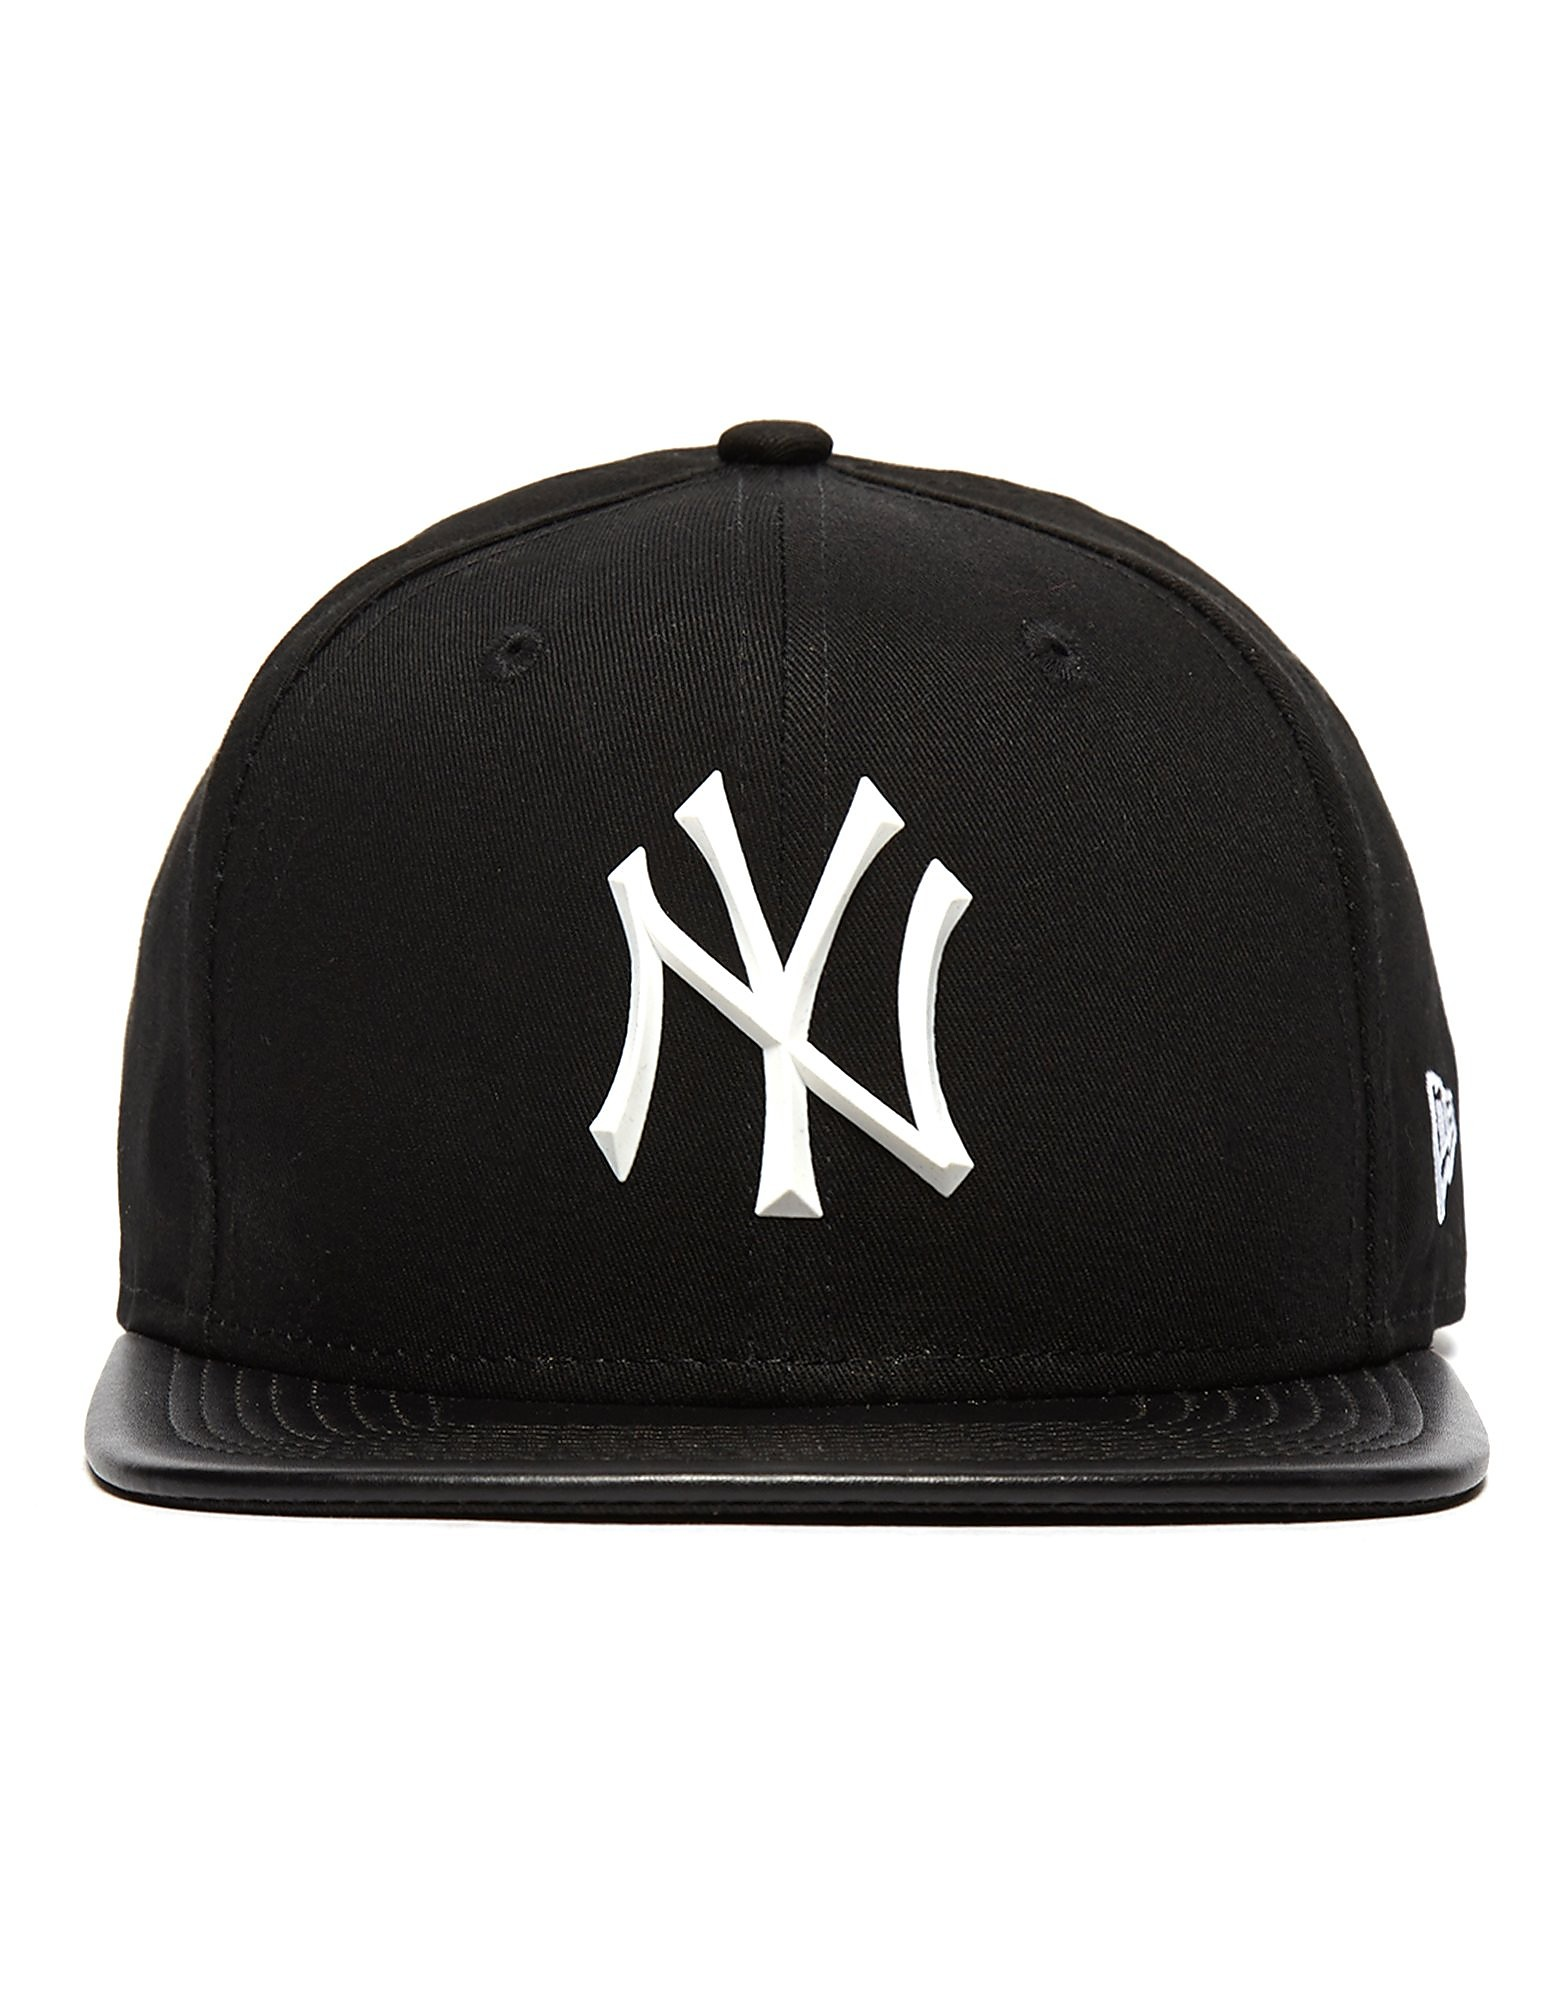 New Era 9FIFTY MLB New York Yankees Prime Snapback Cap